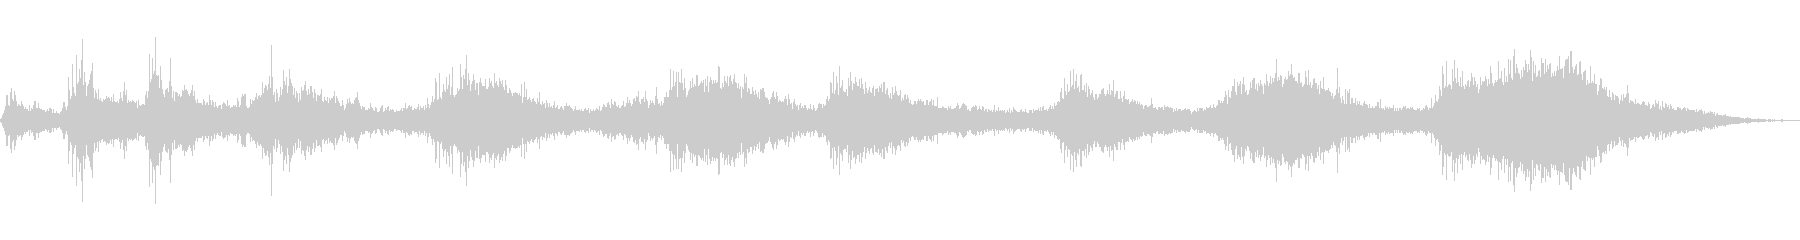 EXT:スタート、アイドリングライ...の未再生の波形